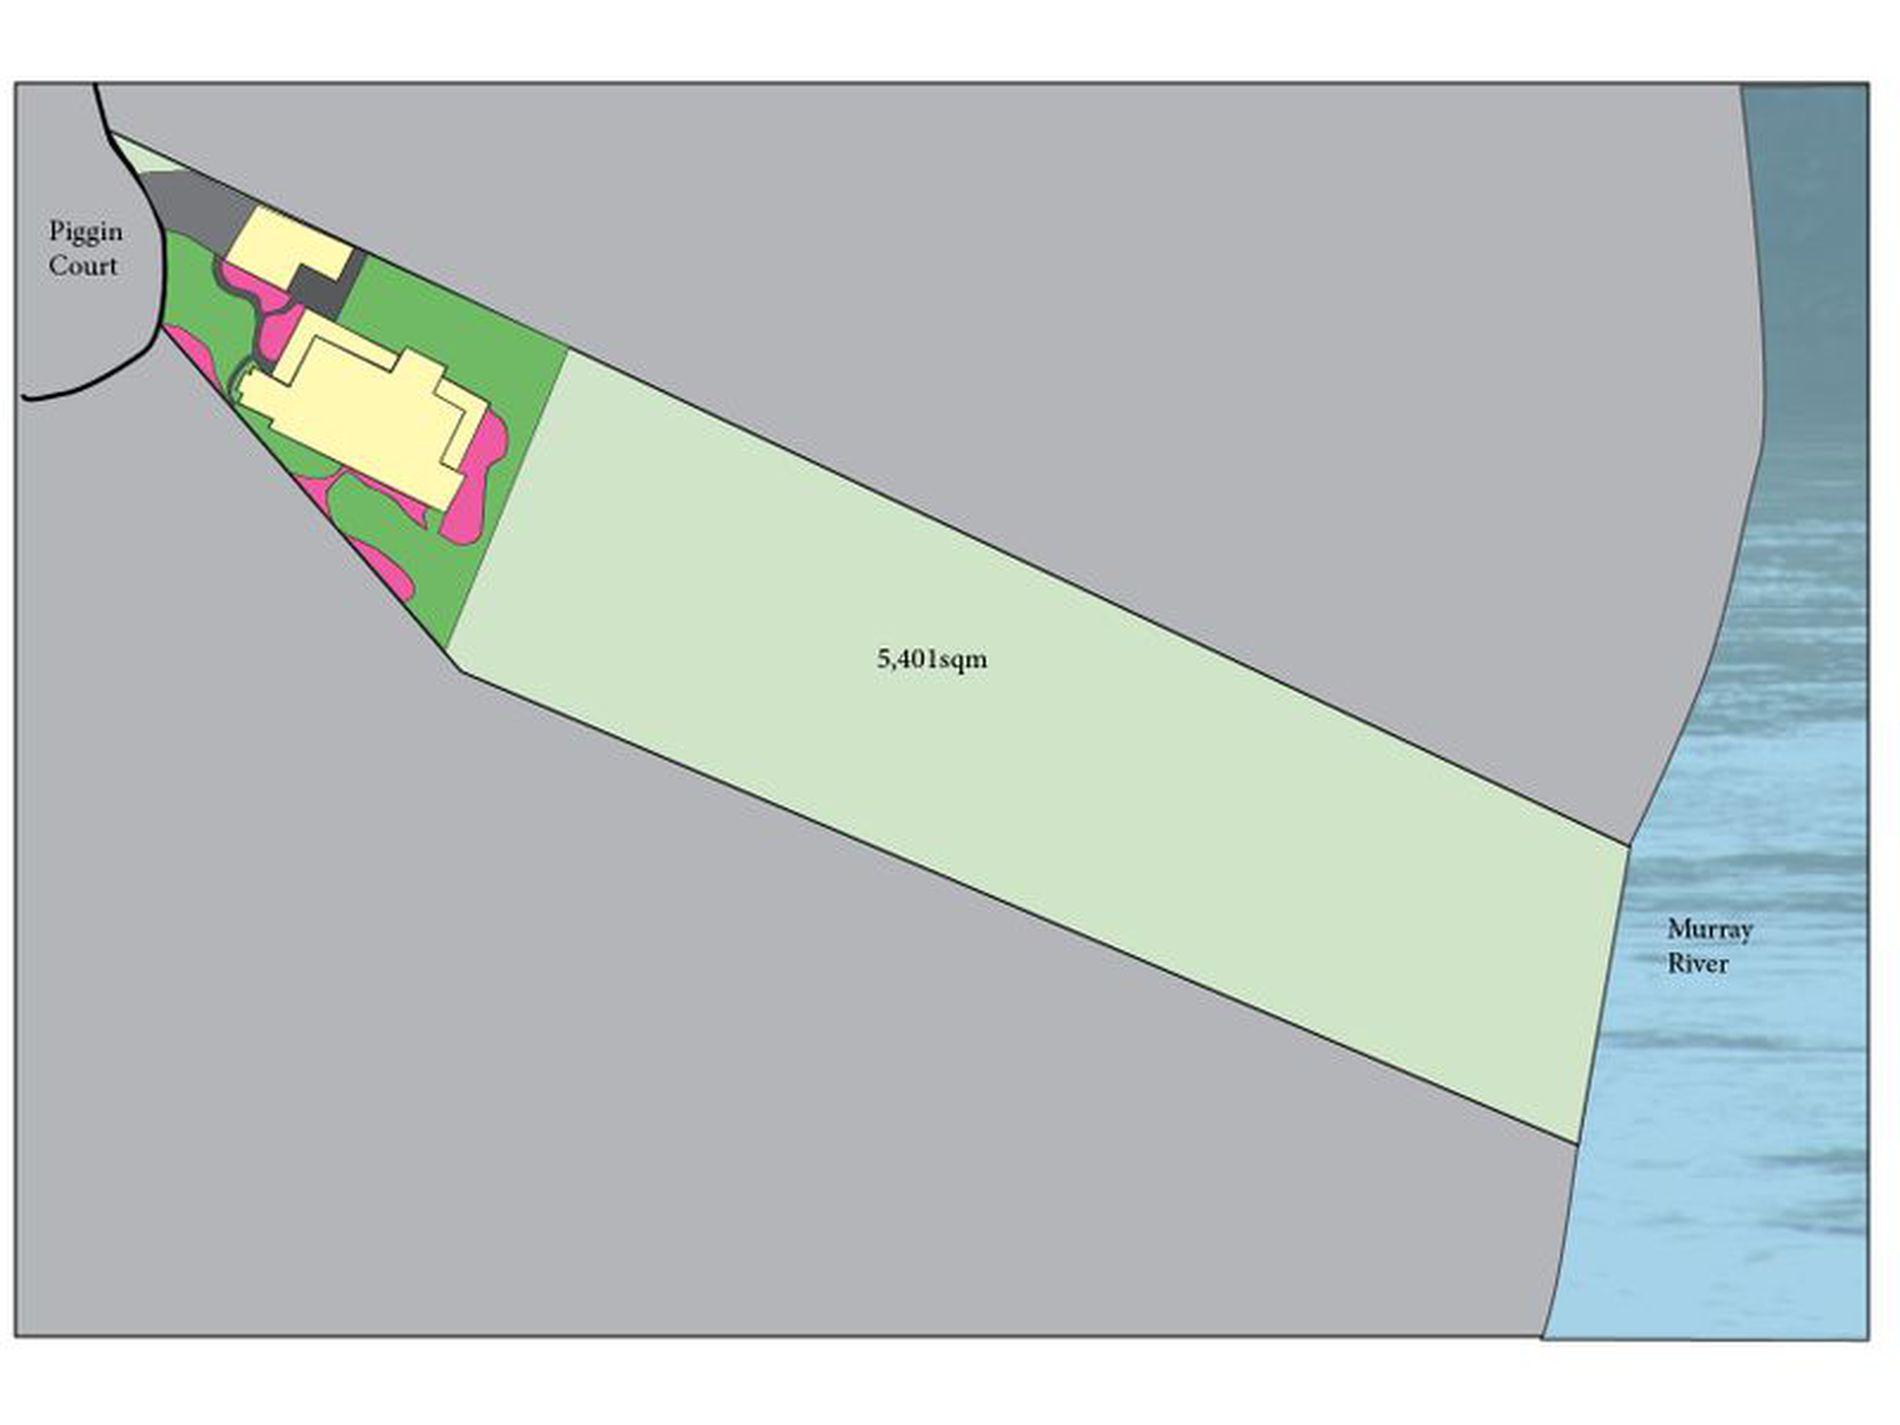 7 Piggin Court, Corowa